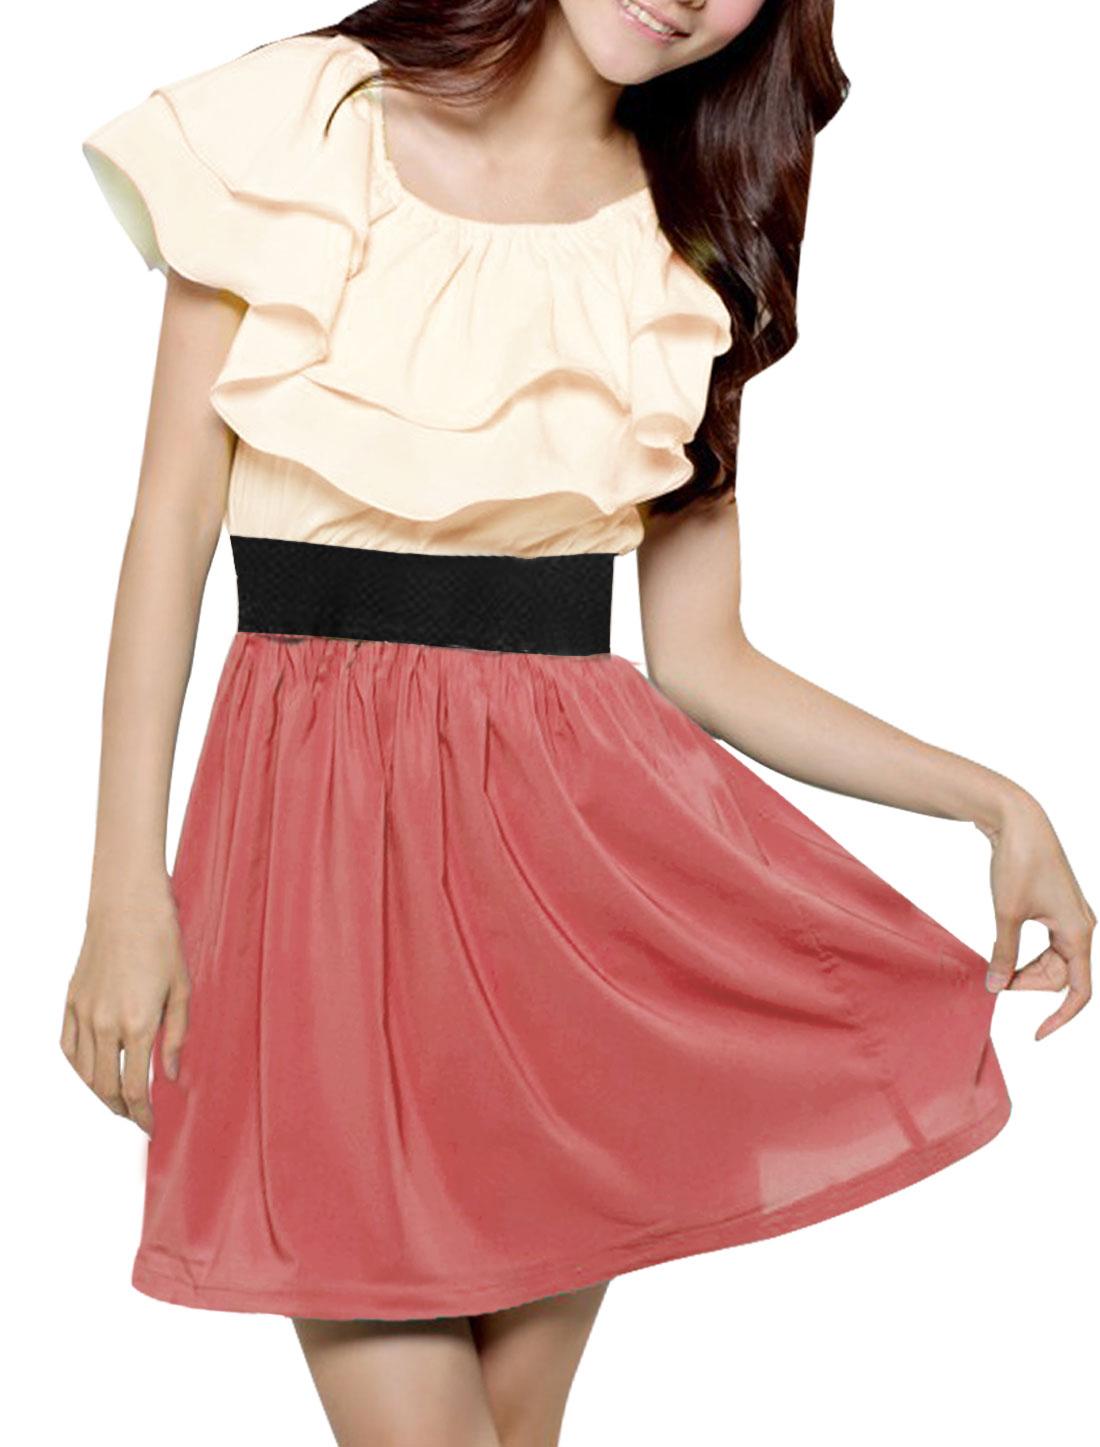 Lady Watermelon Red Beige Off Shoulder Short Sleeve Semi Sheer Elastic Waist Chiffon Dress S